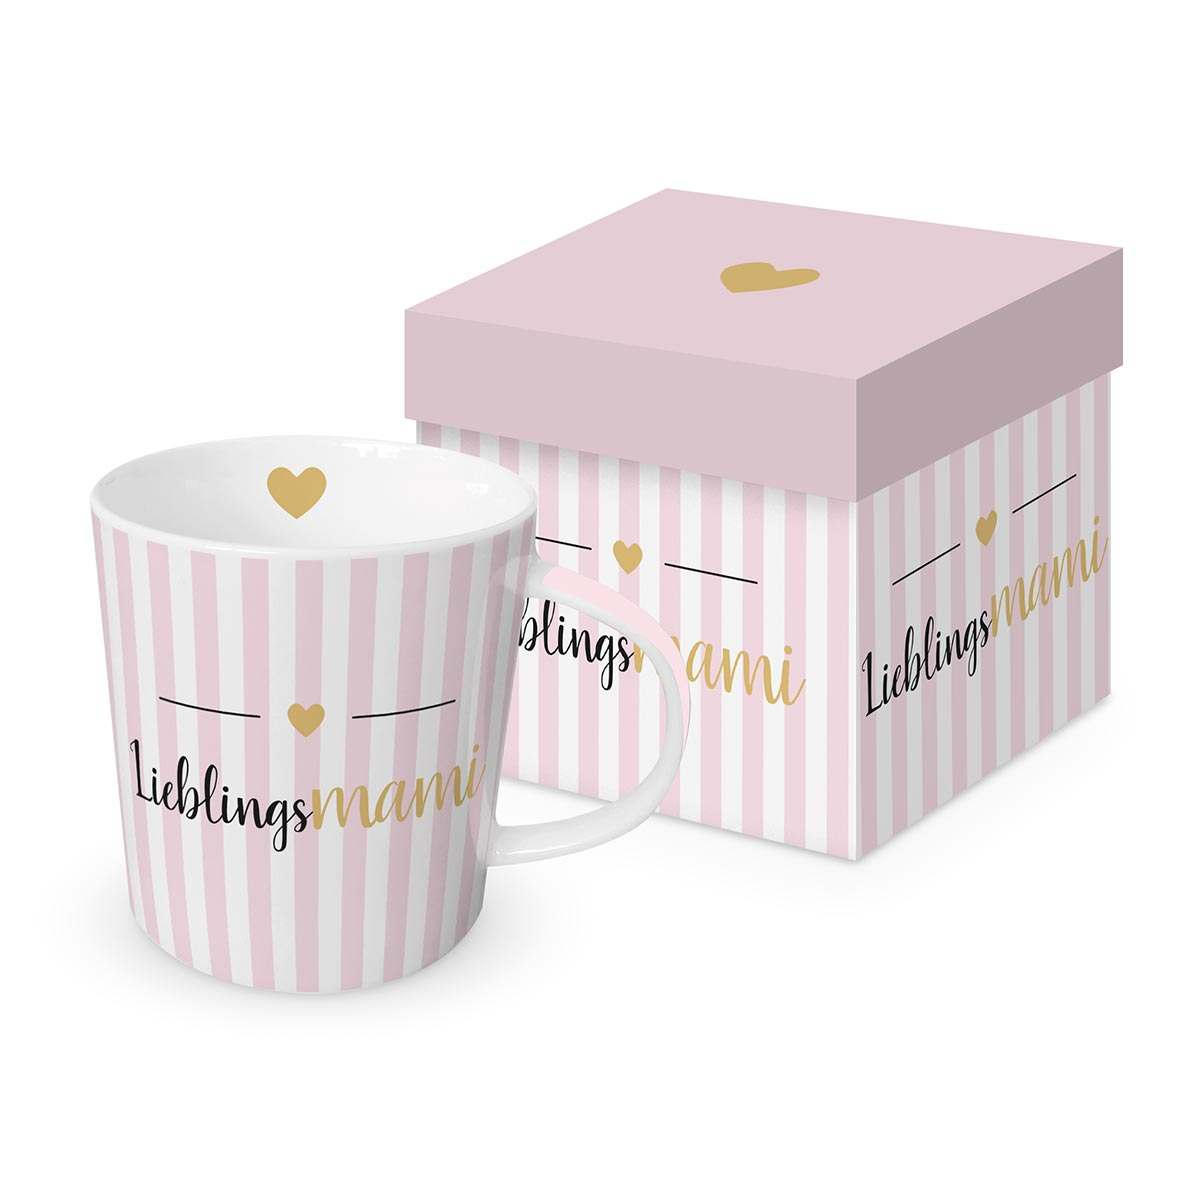 Lieblingsmami Trend Mug GB